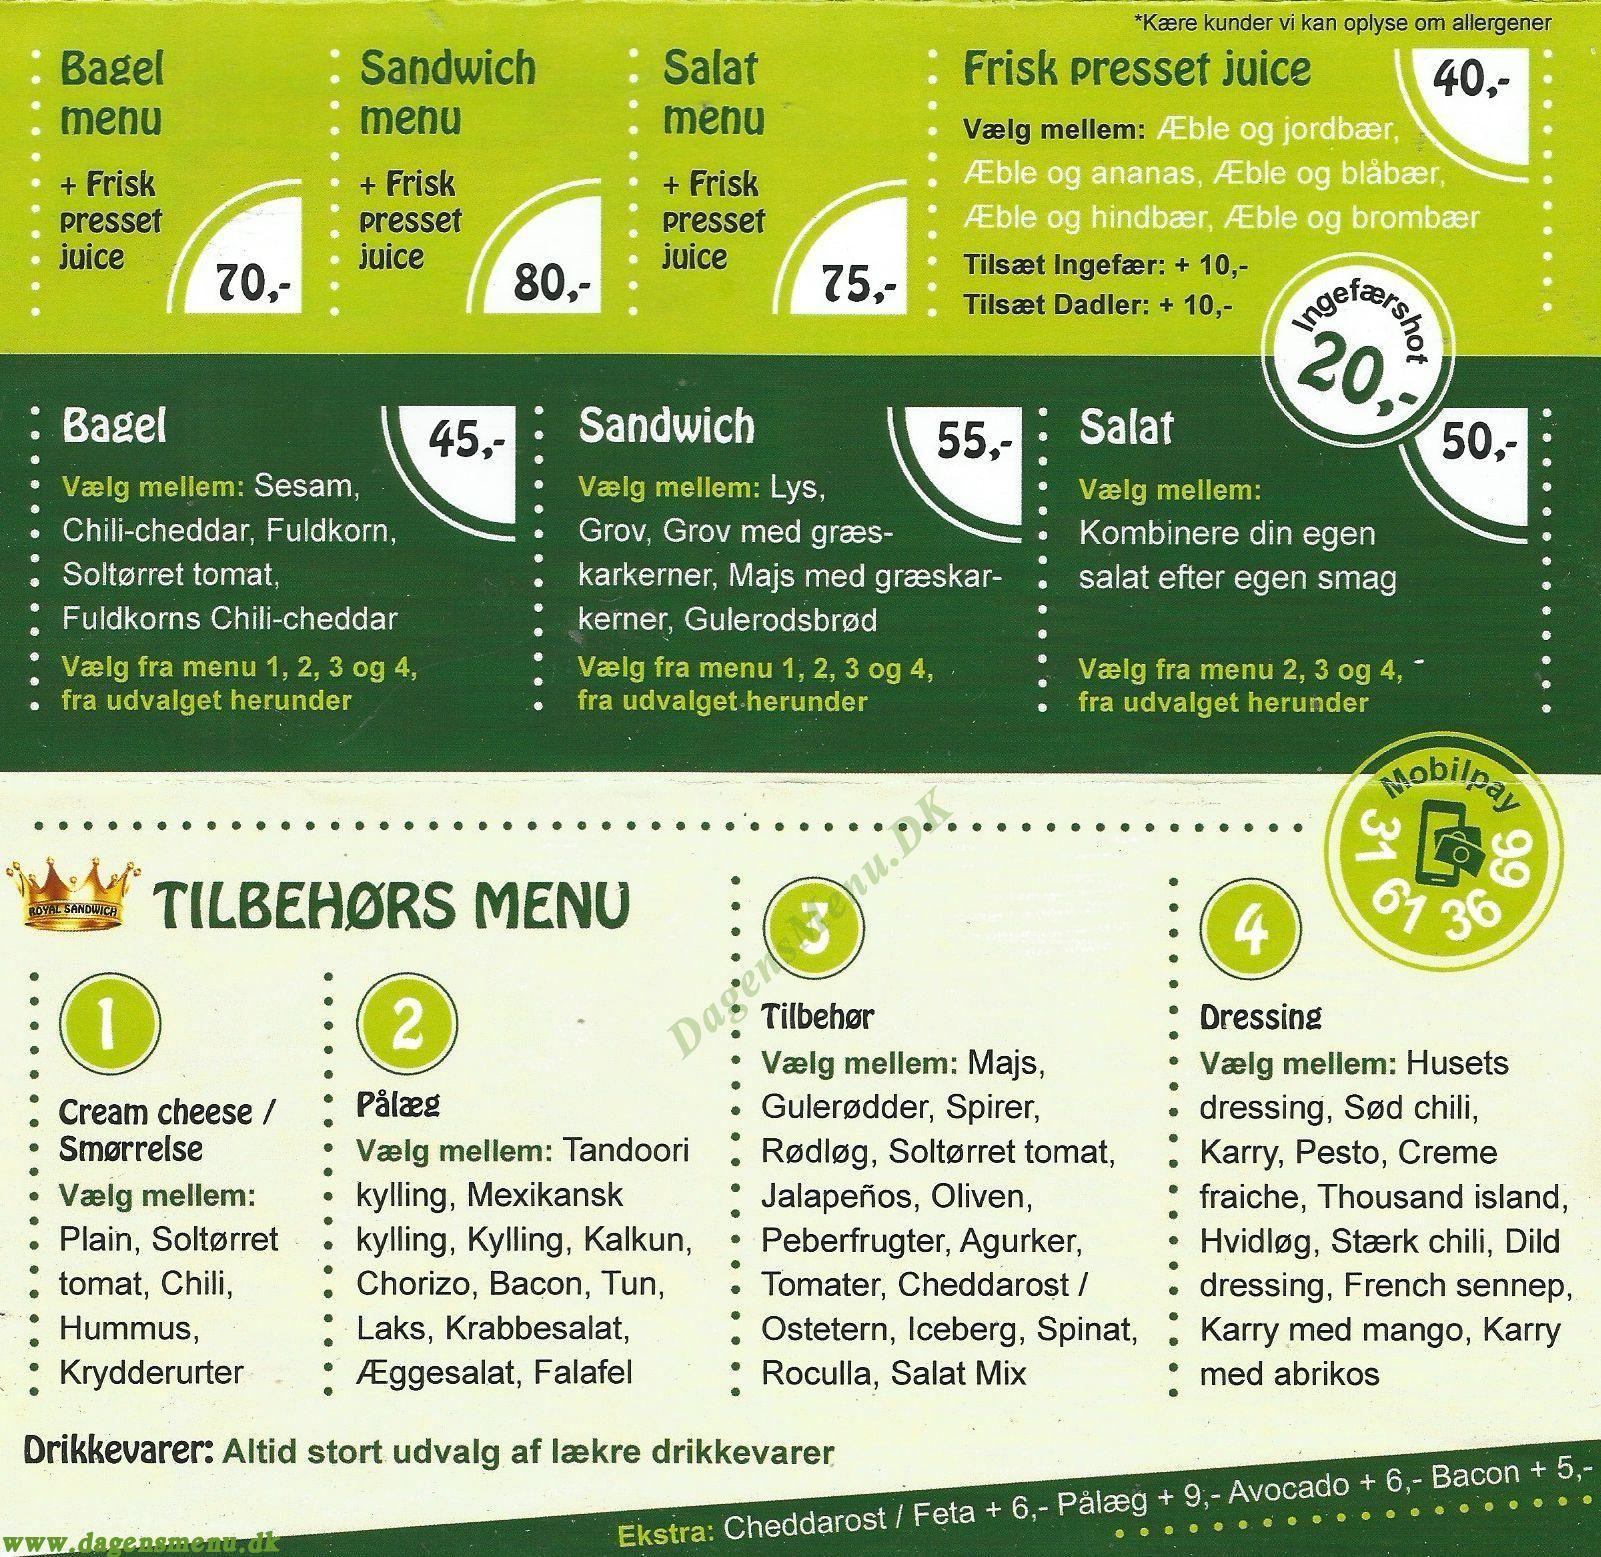 Royal Sandwich, Se menu Ring og Bestil - Menukort